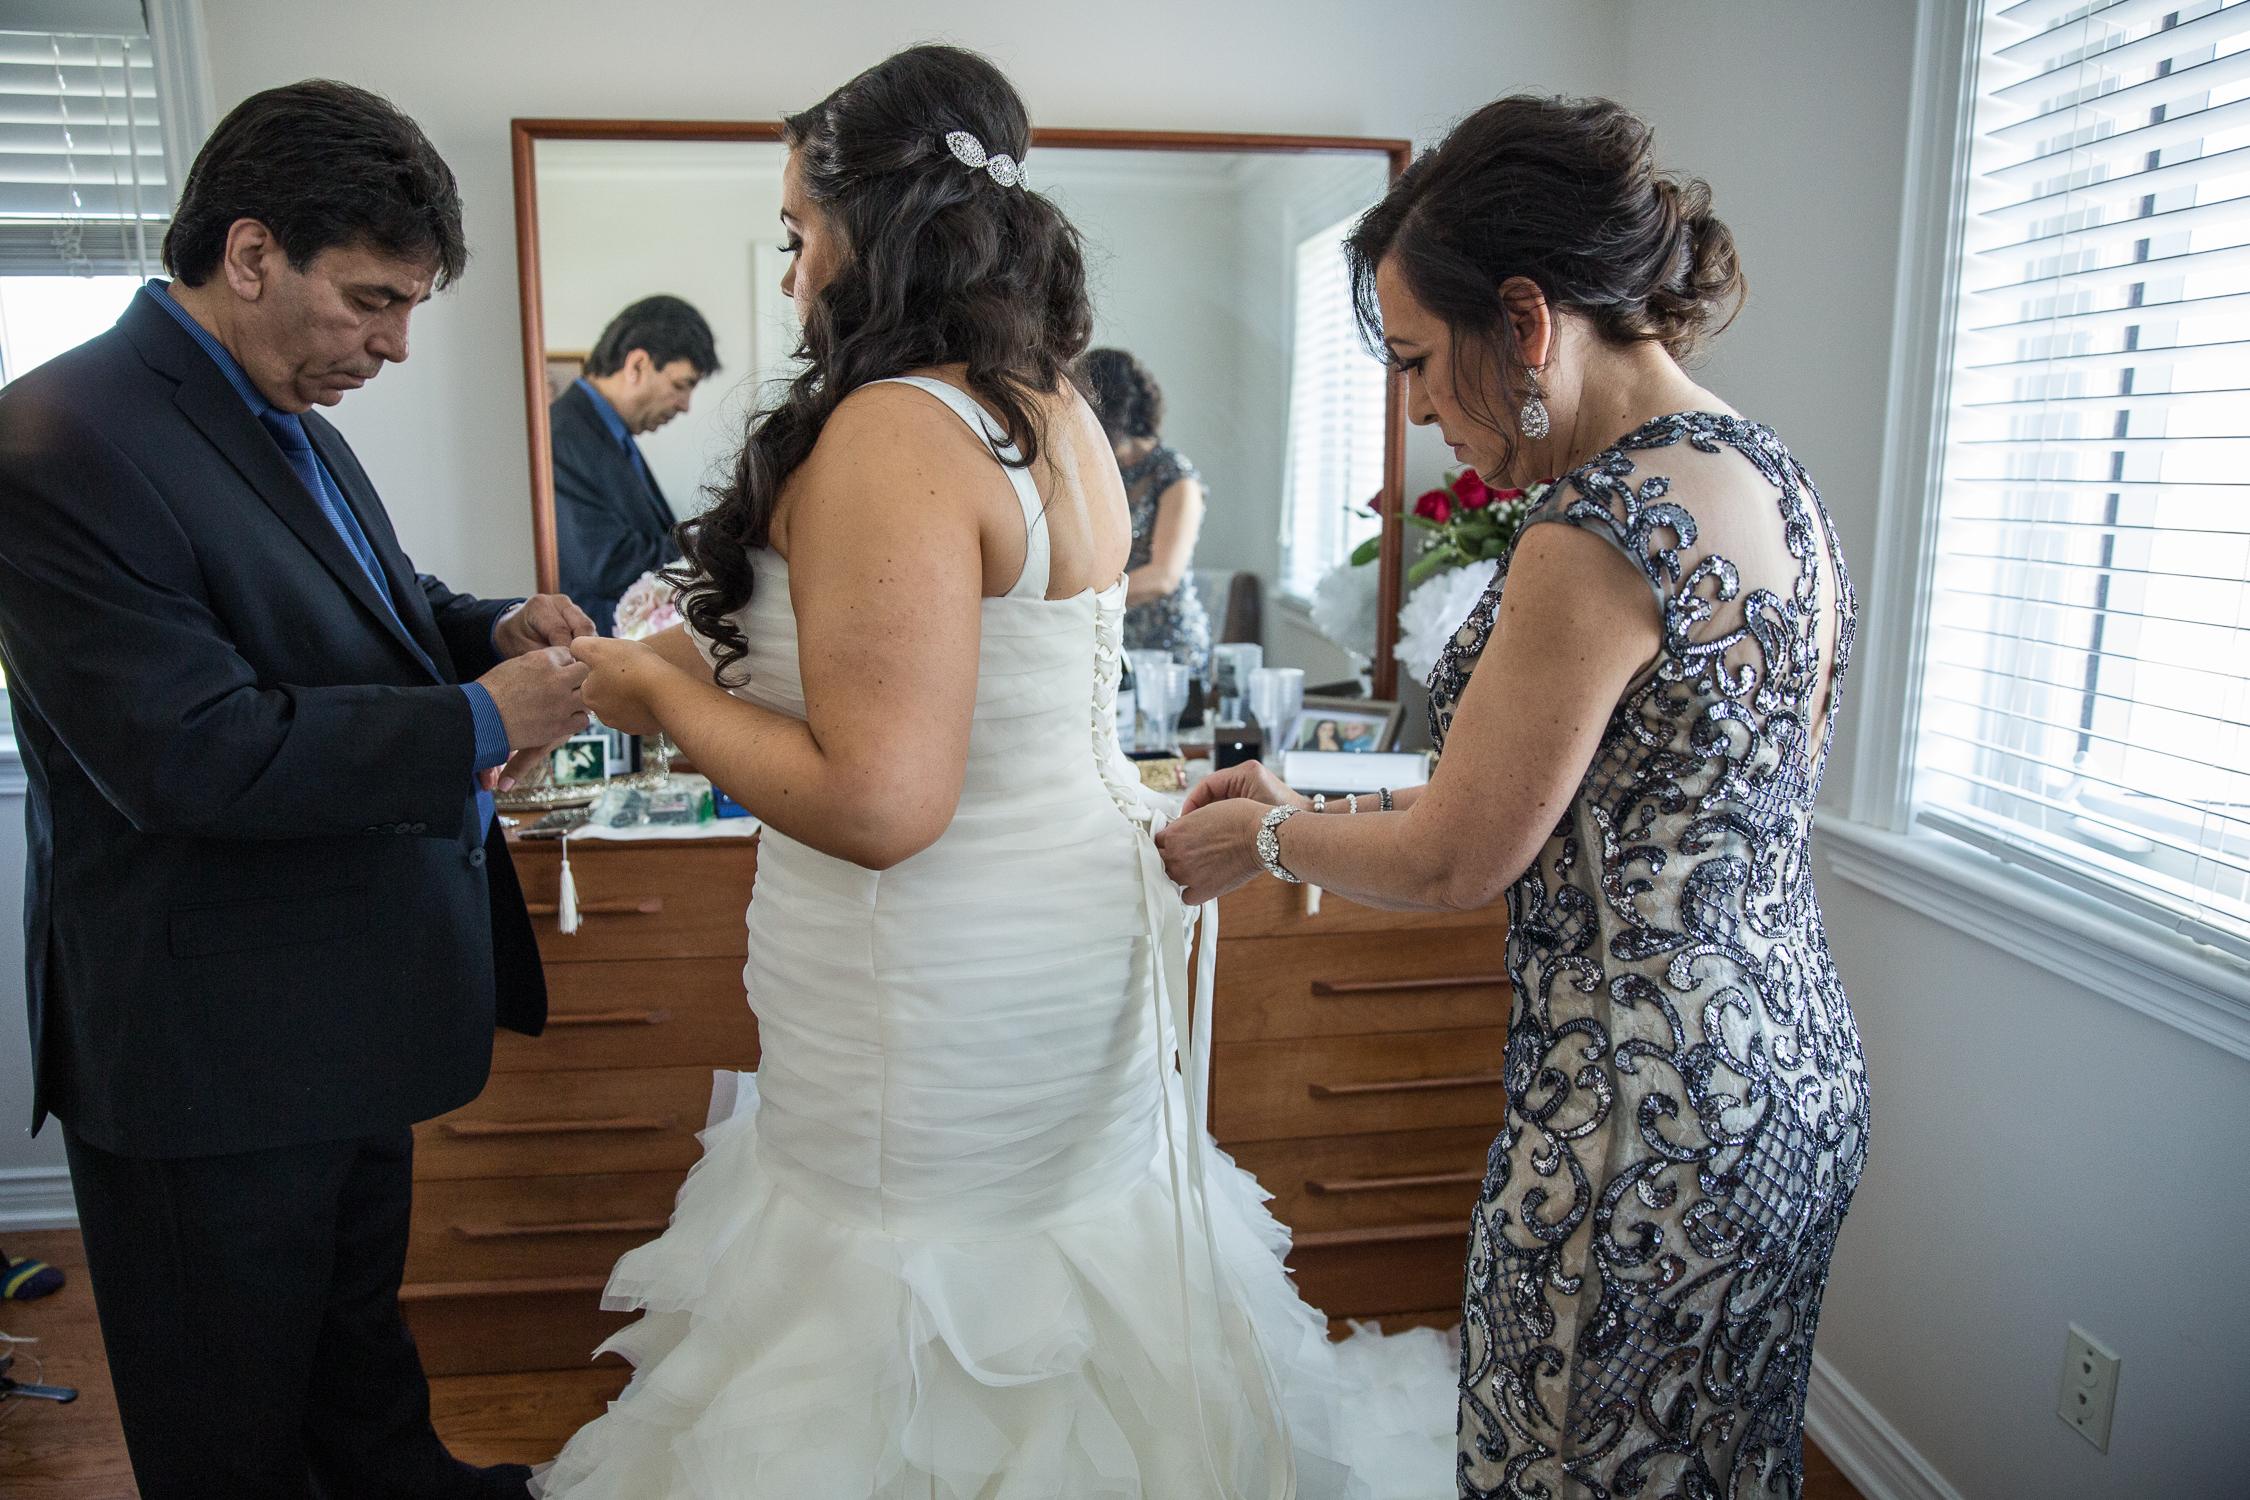 Peter-and-Marie-Wedding-Fontana-Primavera-Graydon-Hall-Manor-Toronto-Ontario-Canada-0008.jpg